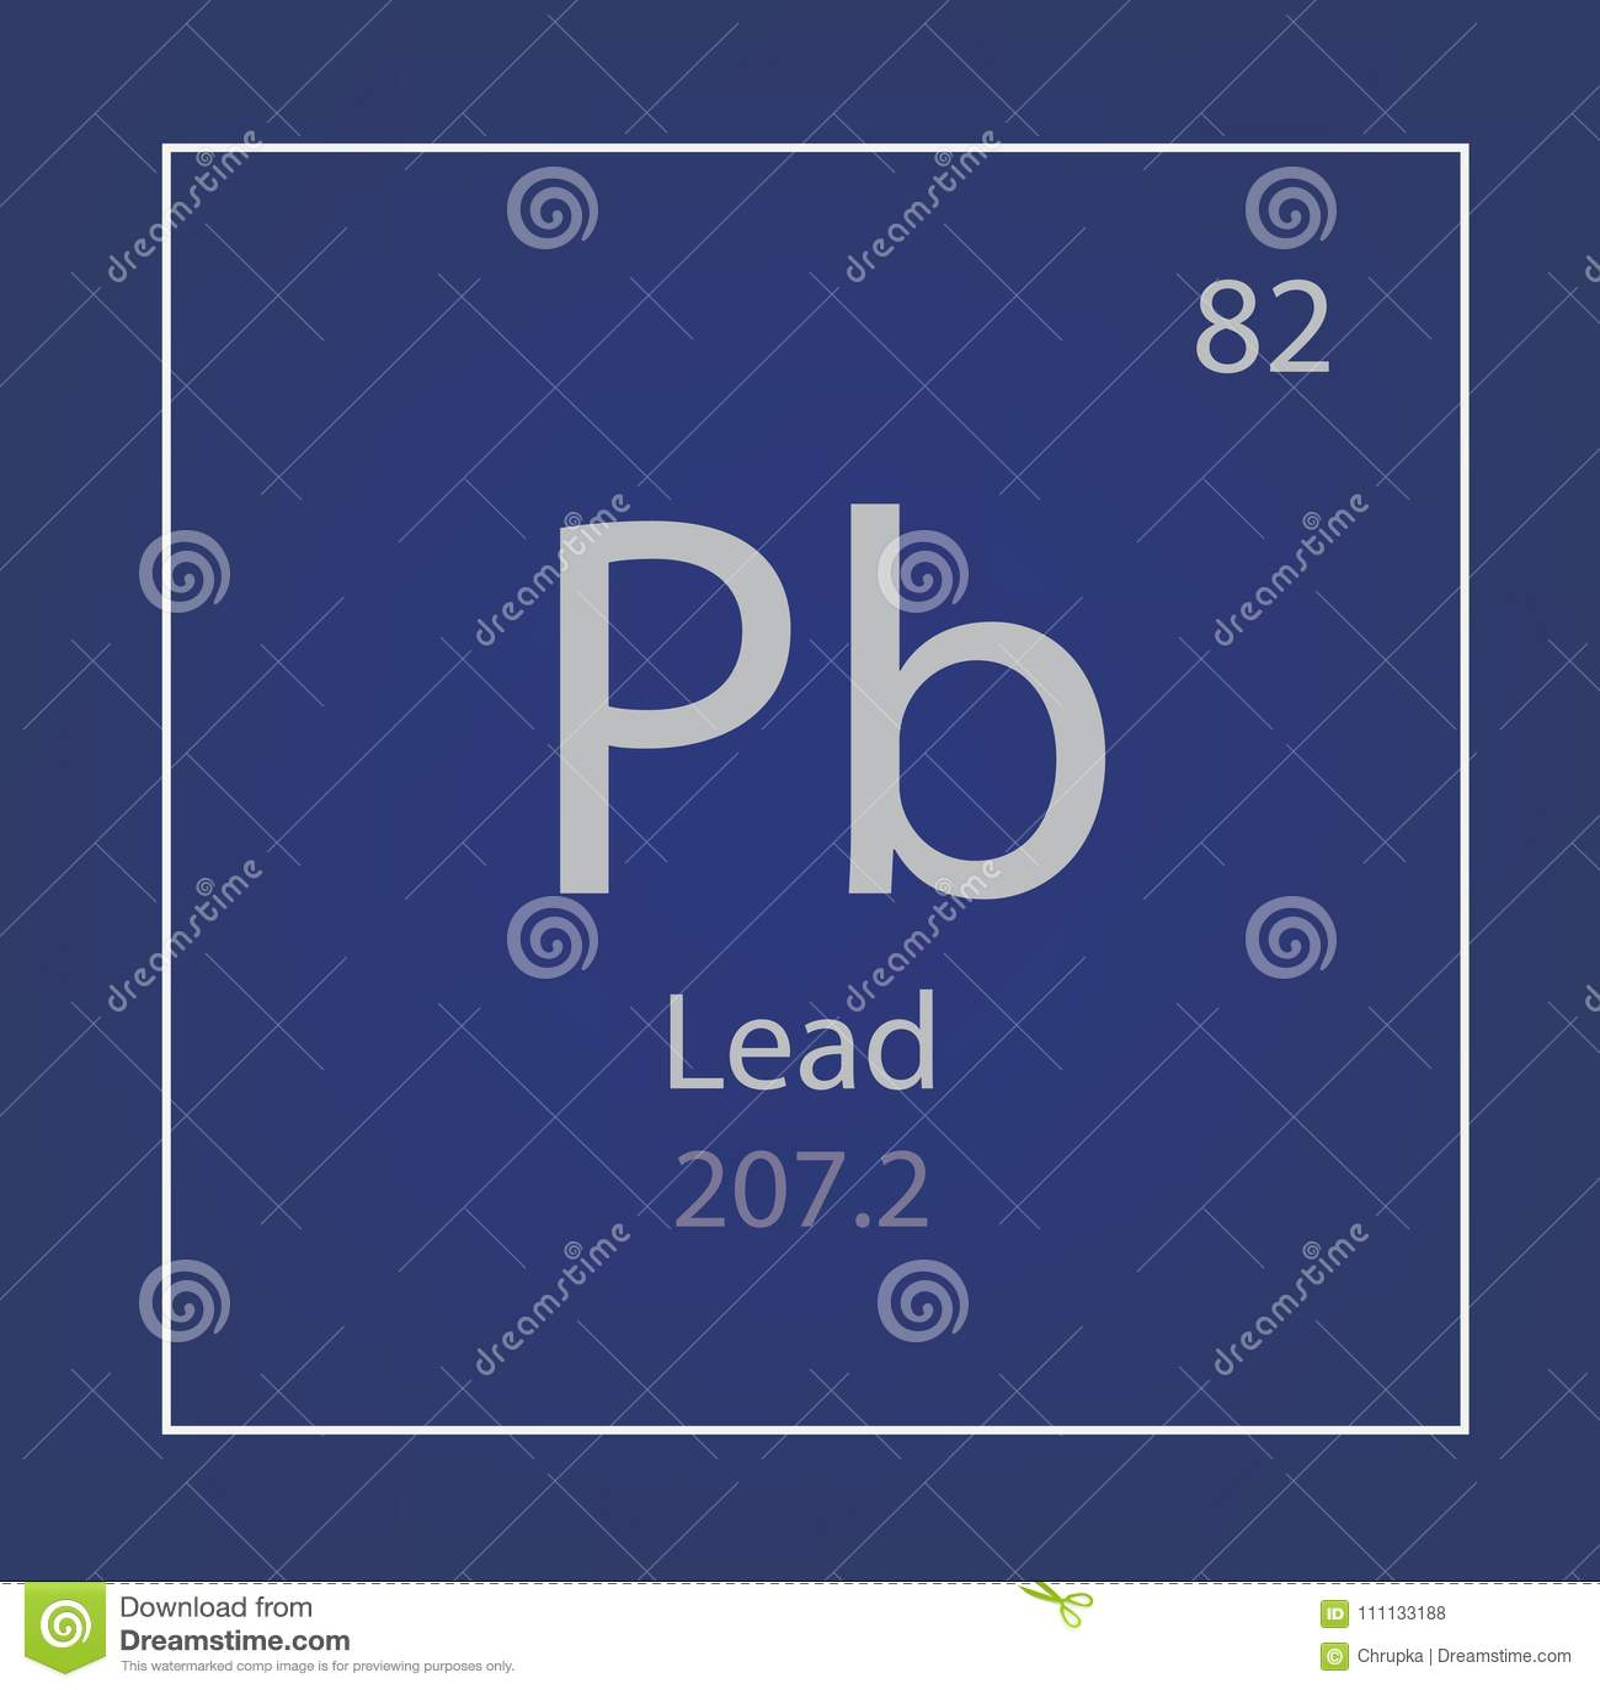 Lead Pb Chemical Element Icon Stock Vector Illustration Of Symbol